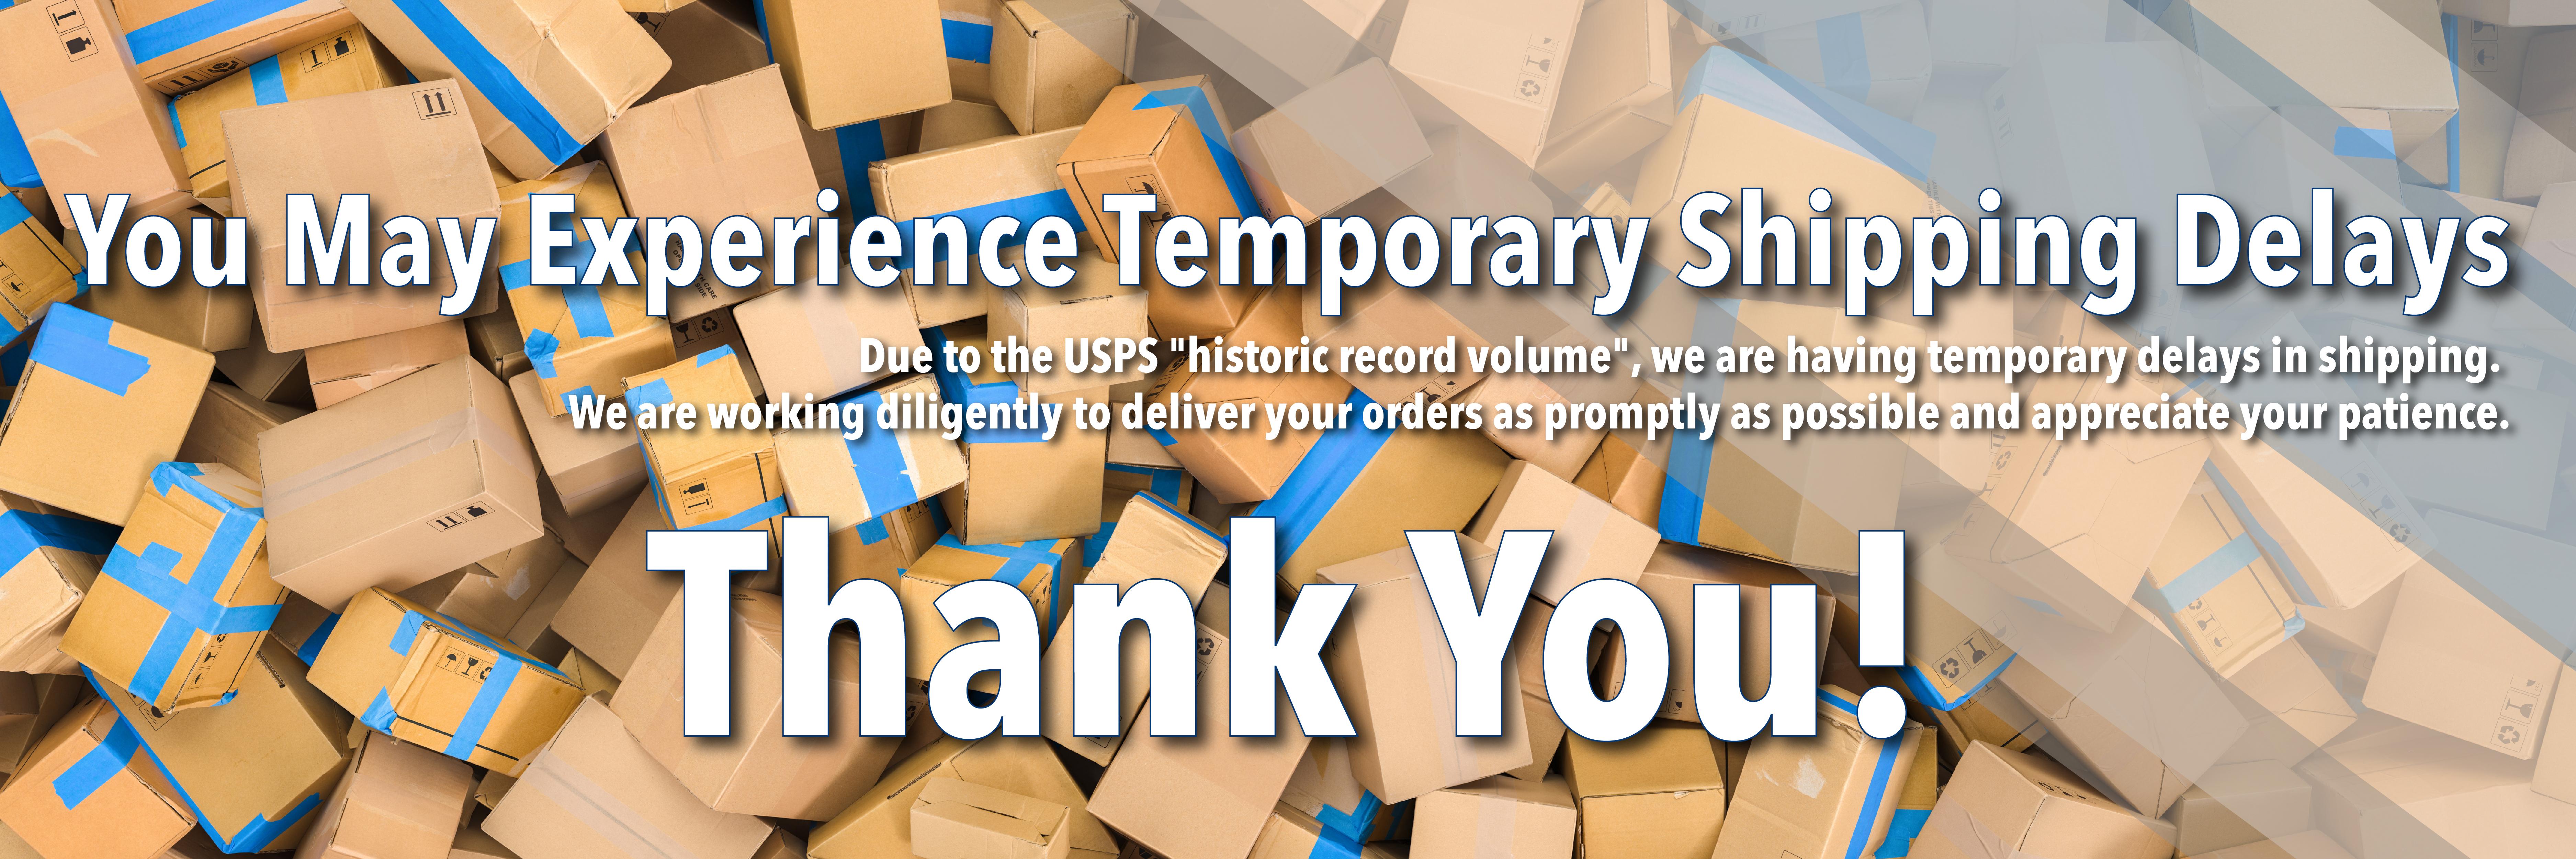 Temporary Shipping Delays